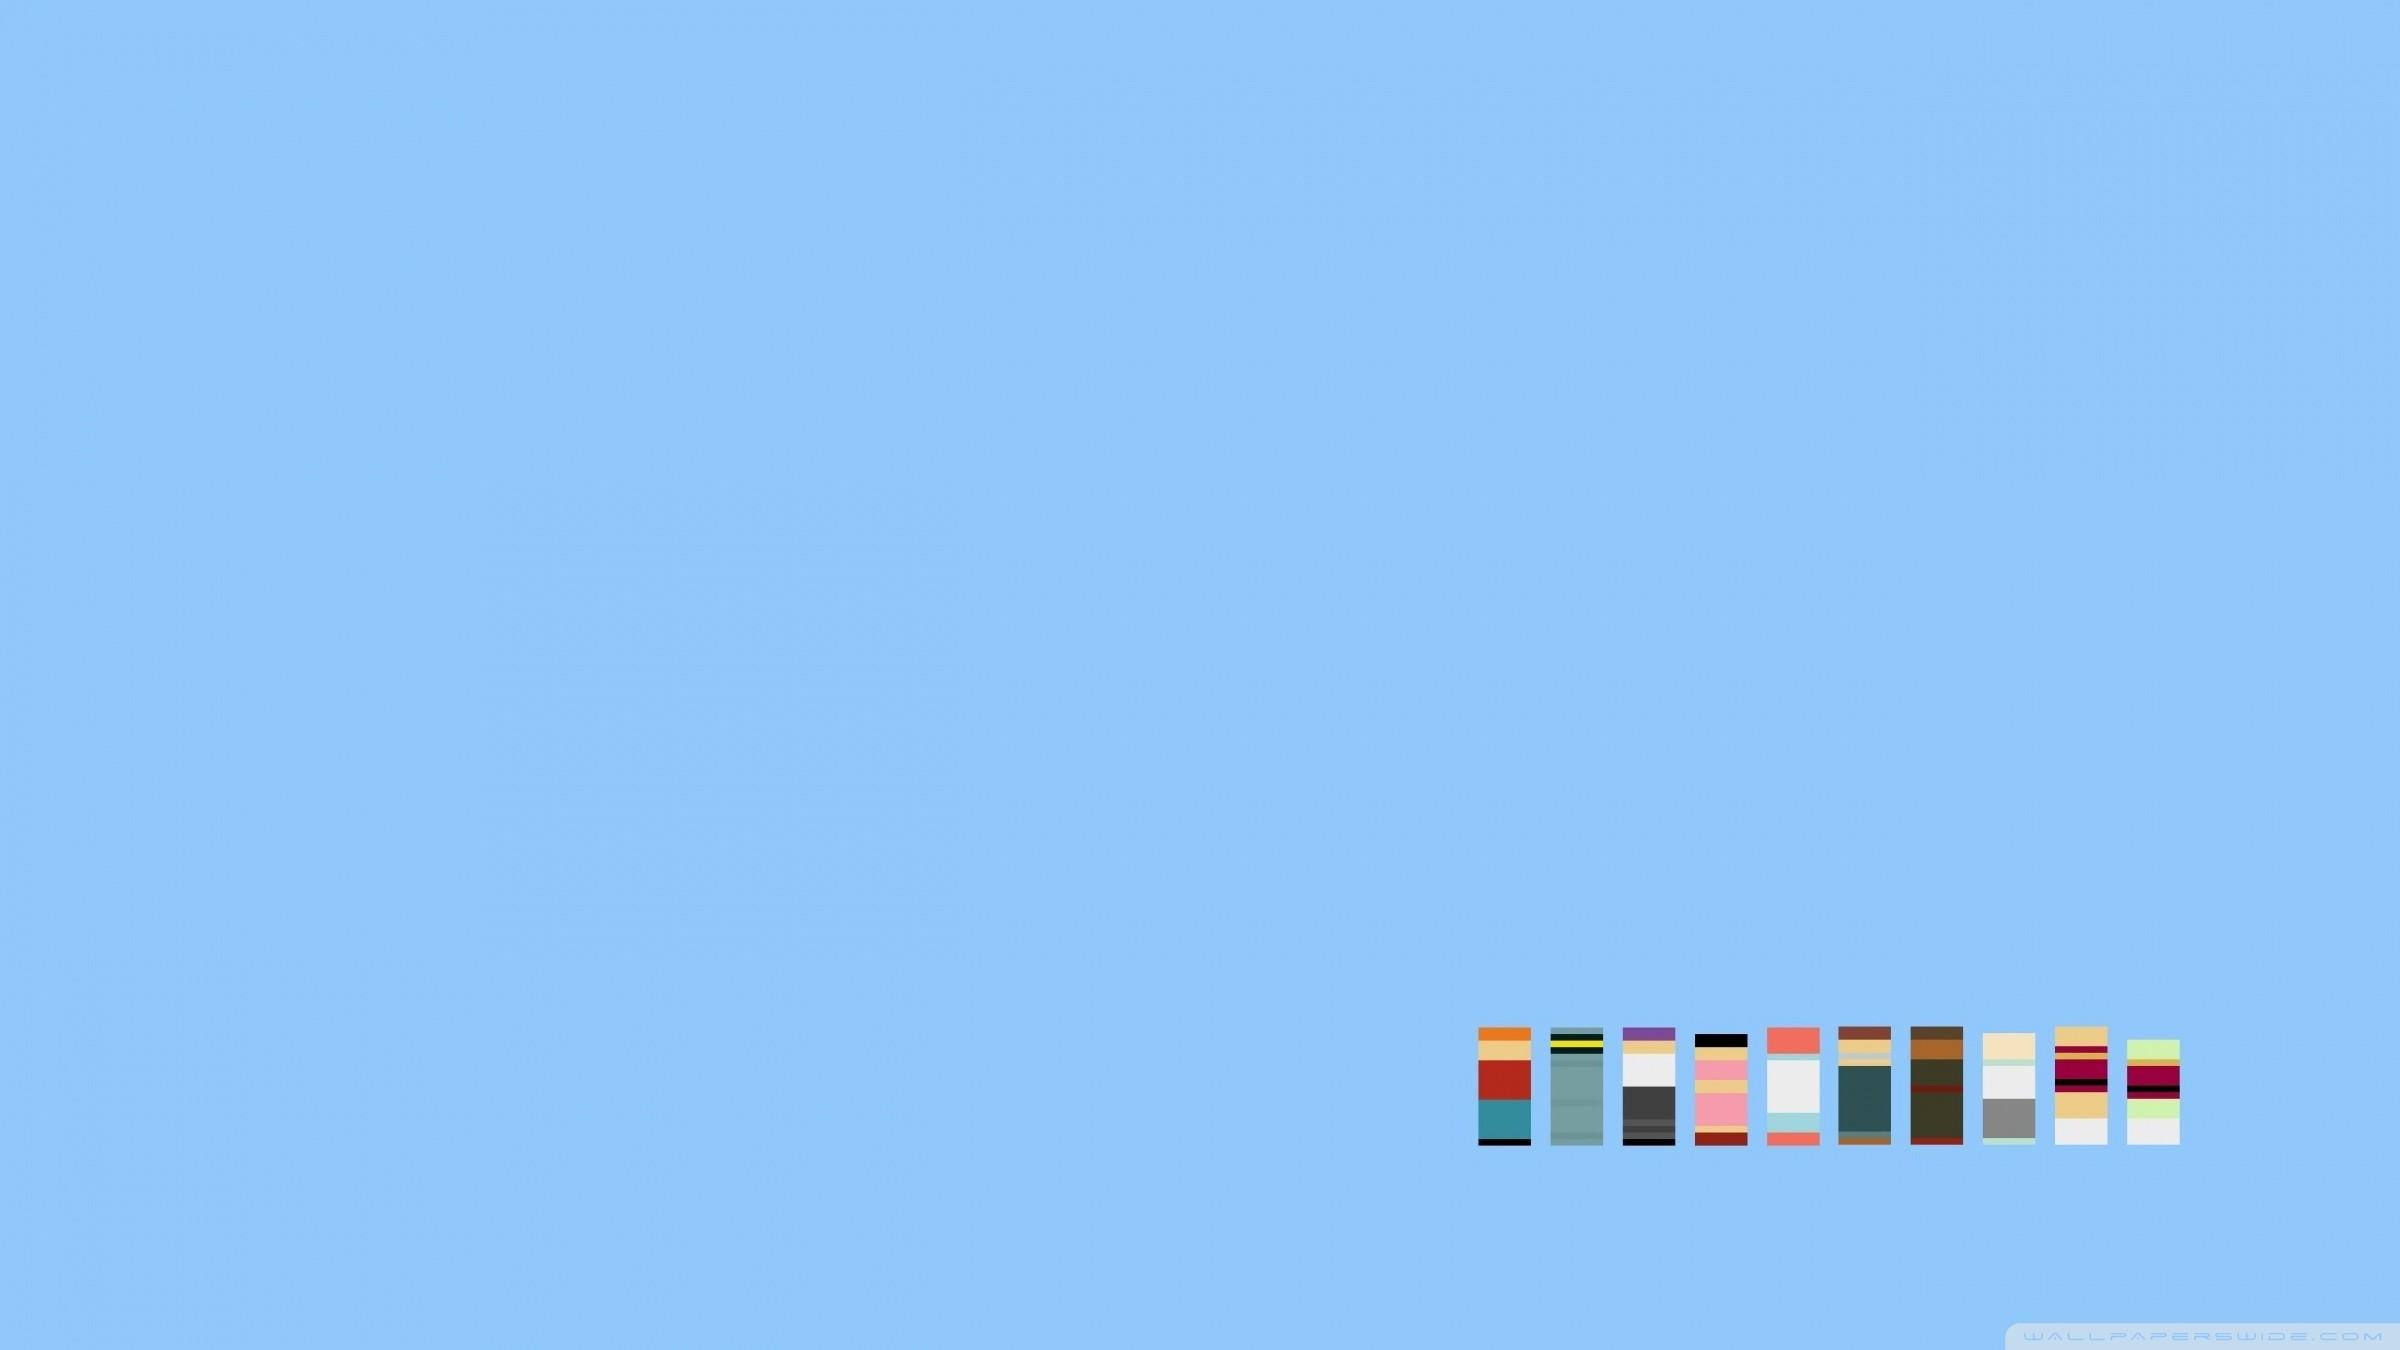 Res: 2400x1350, Minimalist Desktop | Minimalist Desktop Images and Wallpapers on  ModaFinilsale